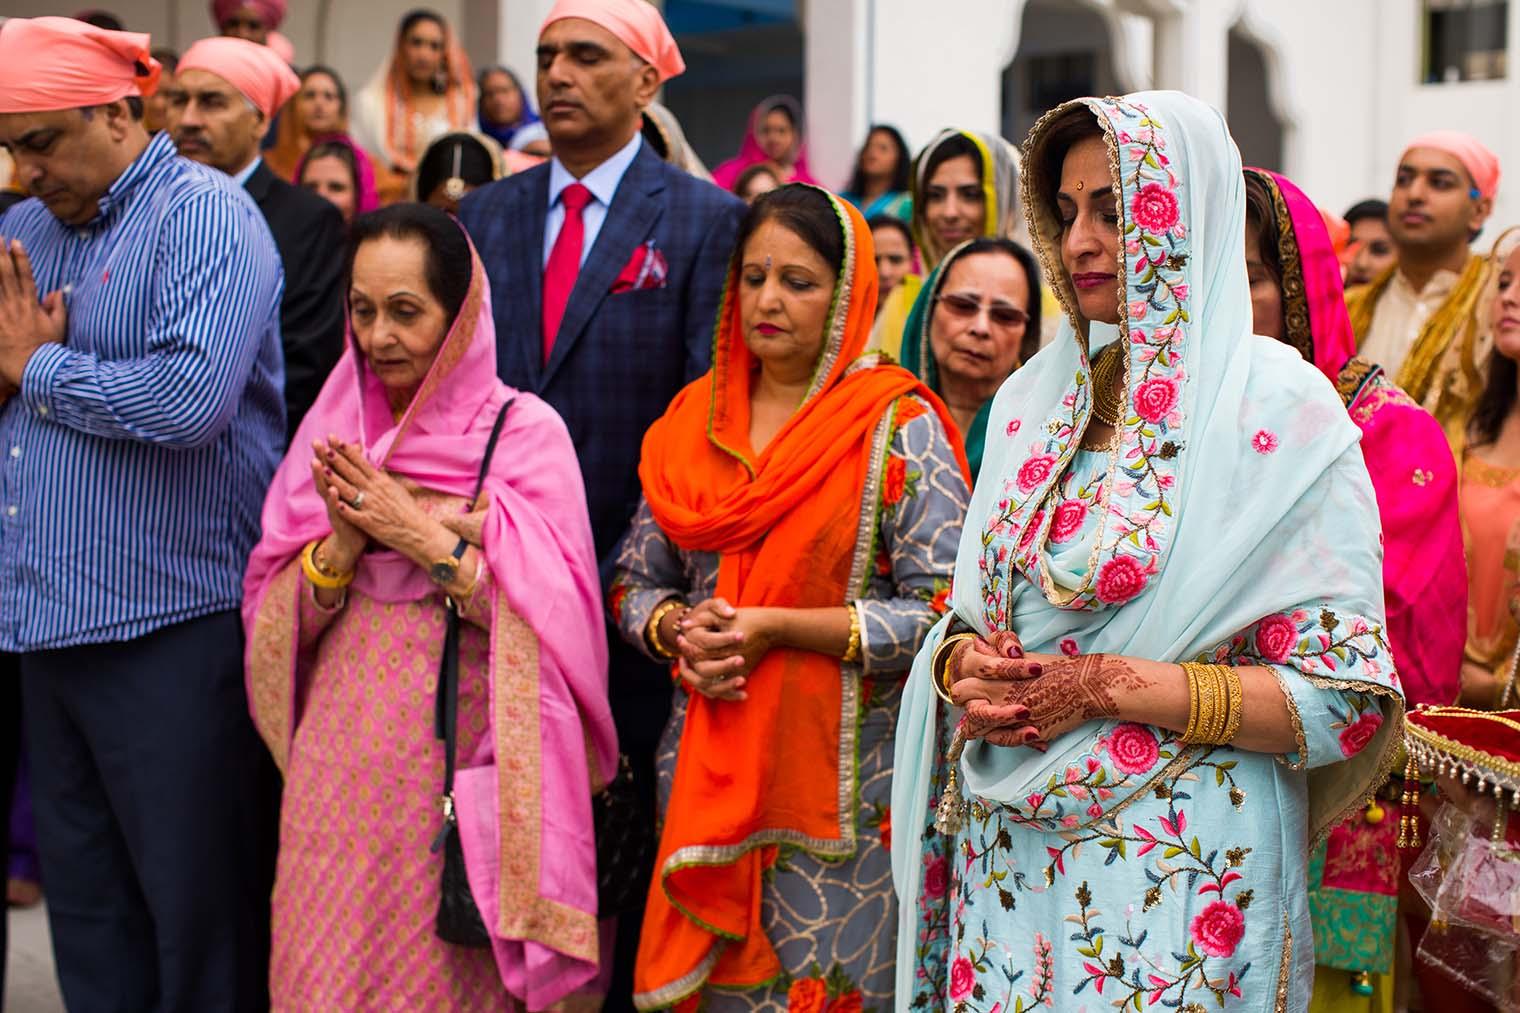 Baraat at Gurdwara Sahib of Fremont Wedding